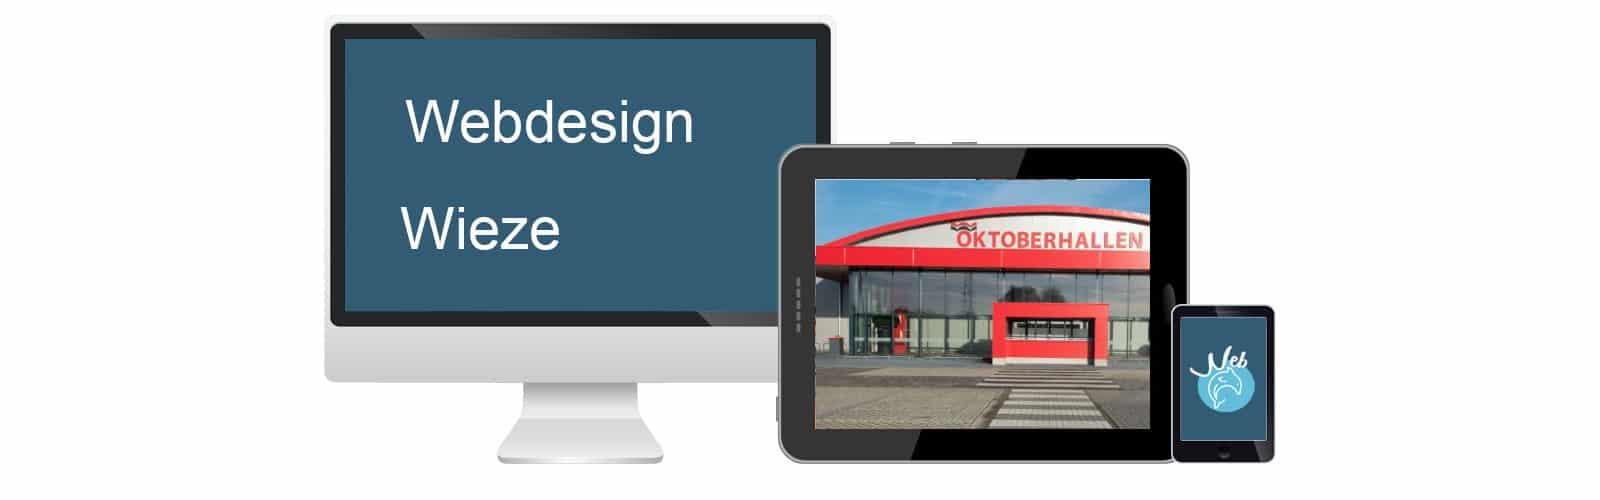 Webdesign Wieze - webdolfijn